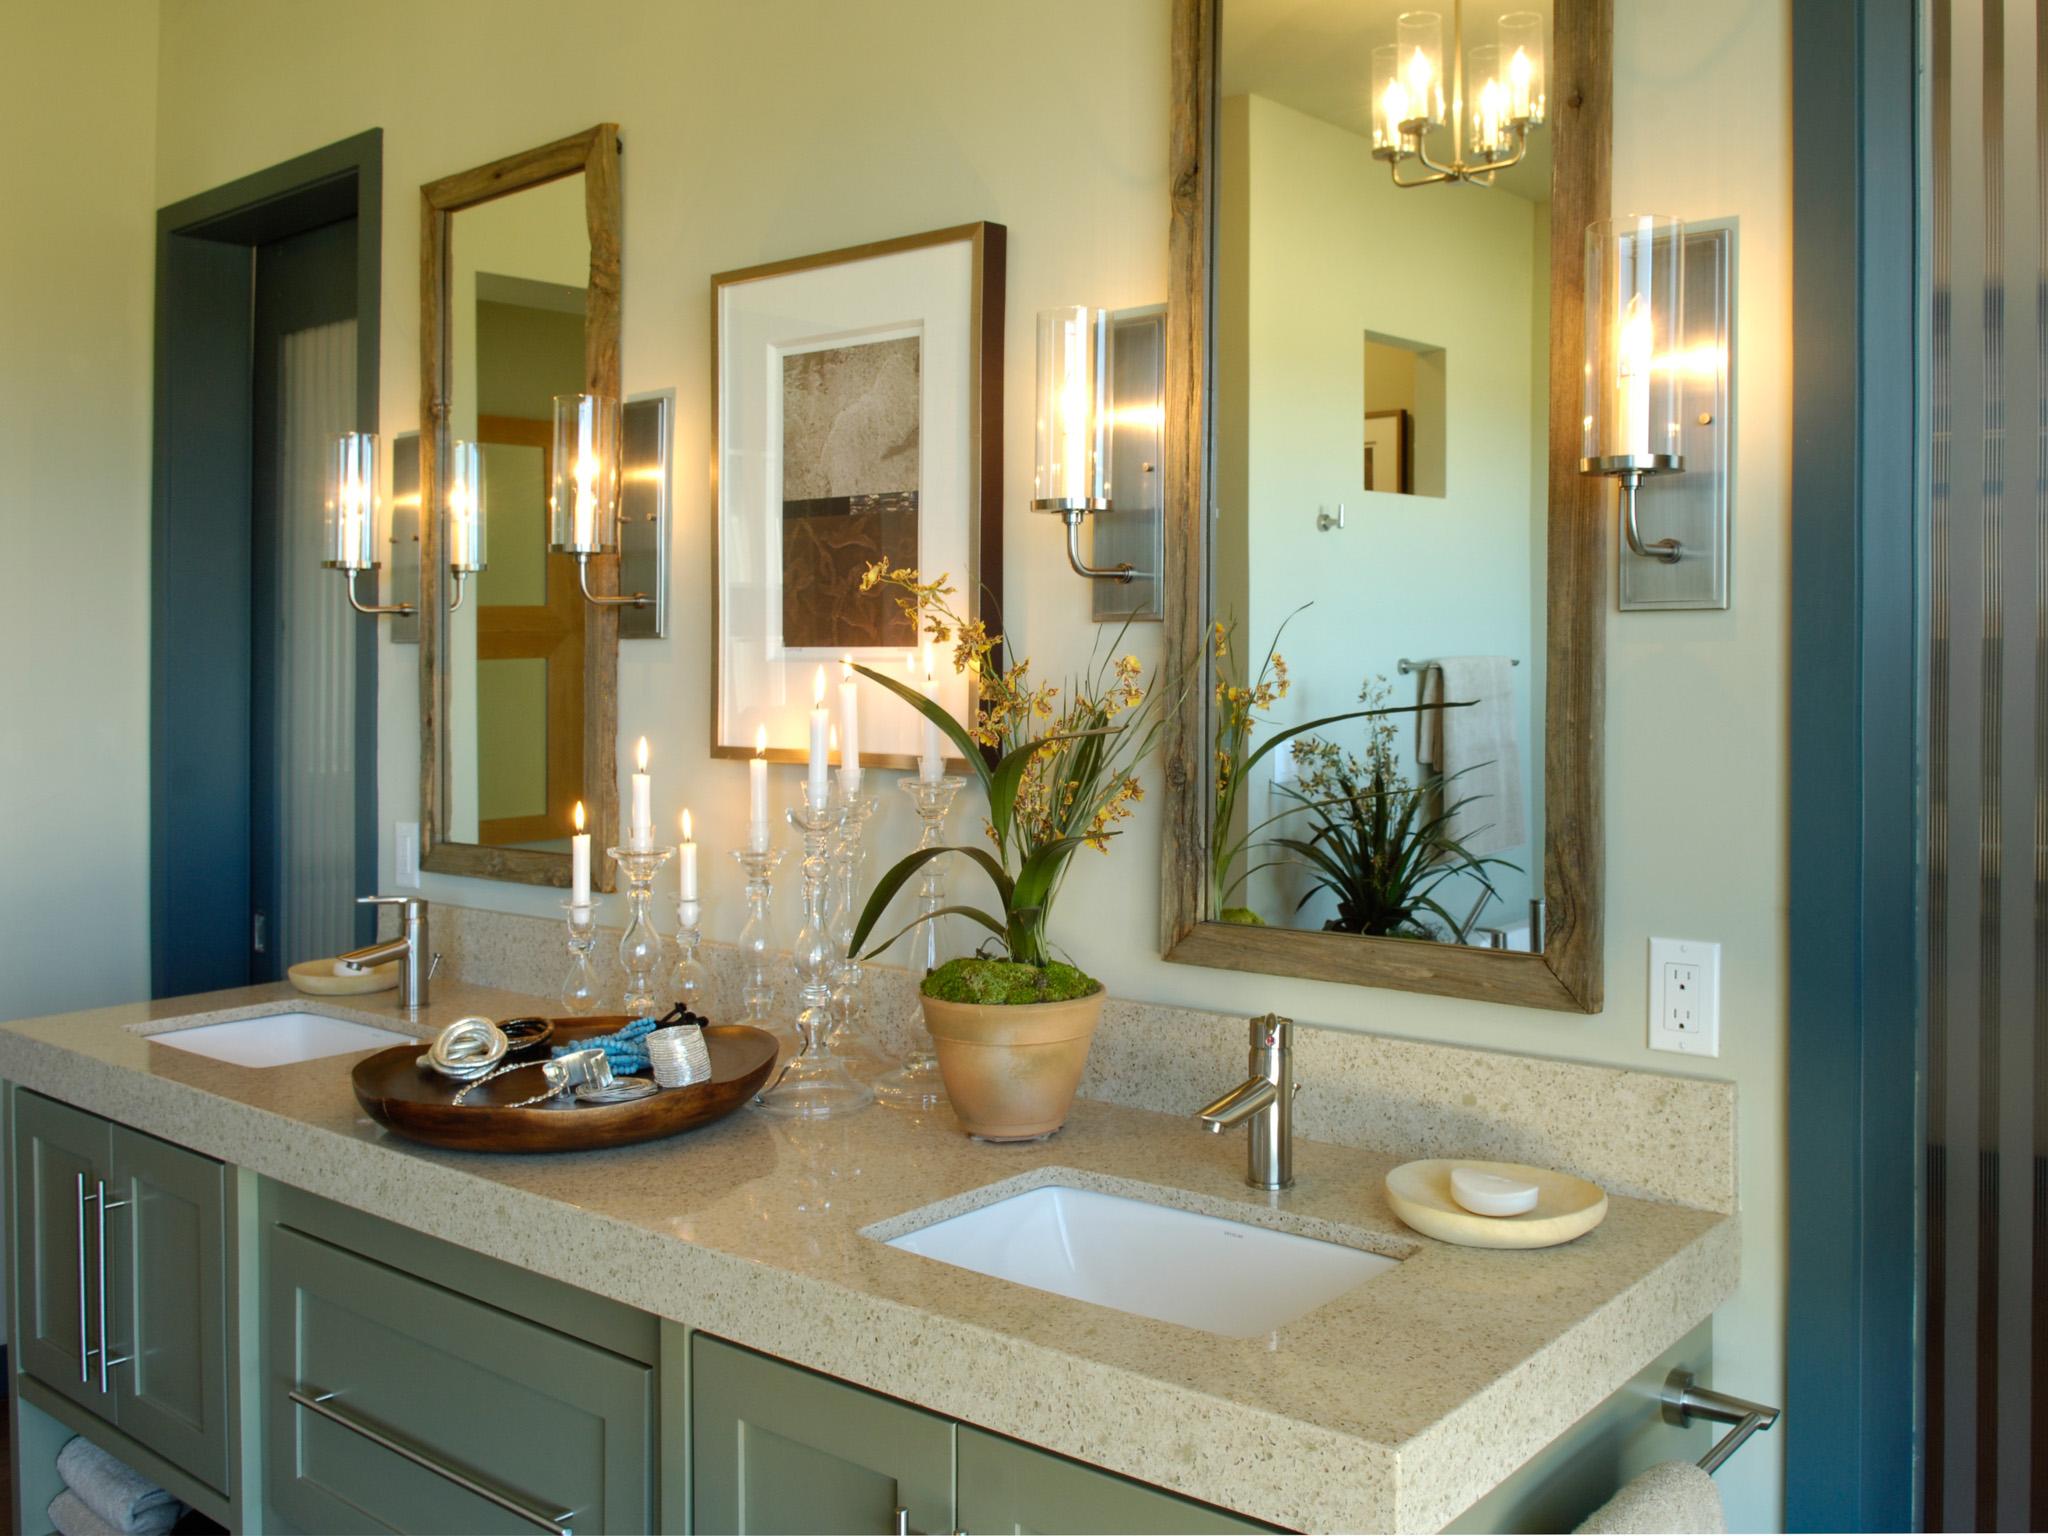 Charming Bathroom Design Ideas 2013 Part 2  Charming Bathroom. Modern Bathroom Design Ideas 2013   Rukinet com